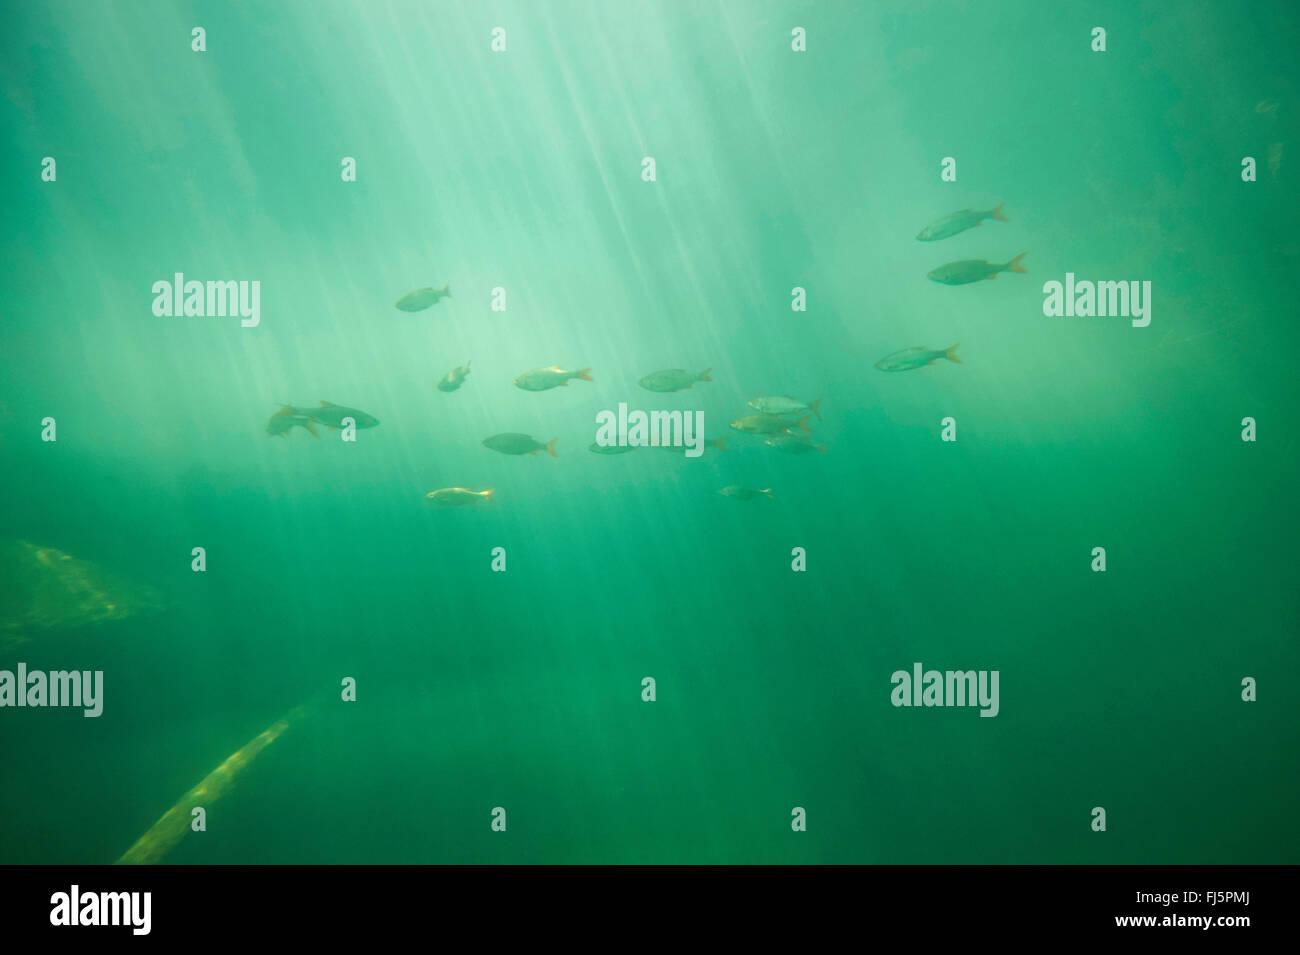 rudd (Scardinius erythrophthalmus), school swimming in a lake, underwater photography, Germany, Bavaria Stock Photo